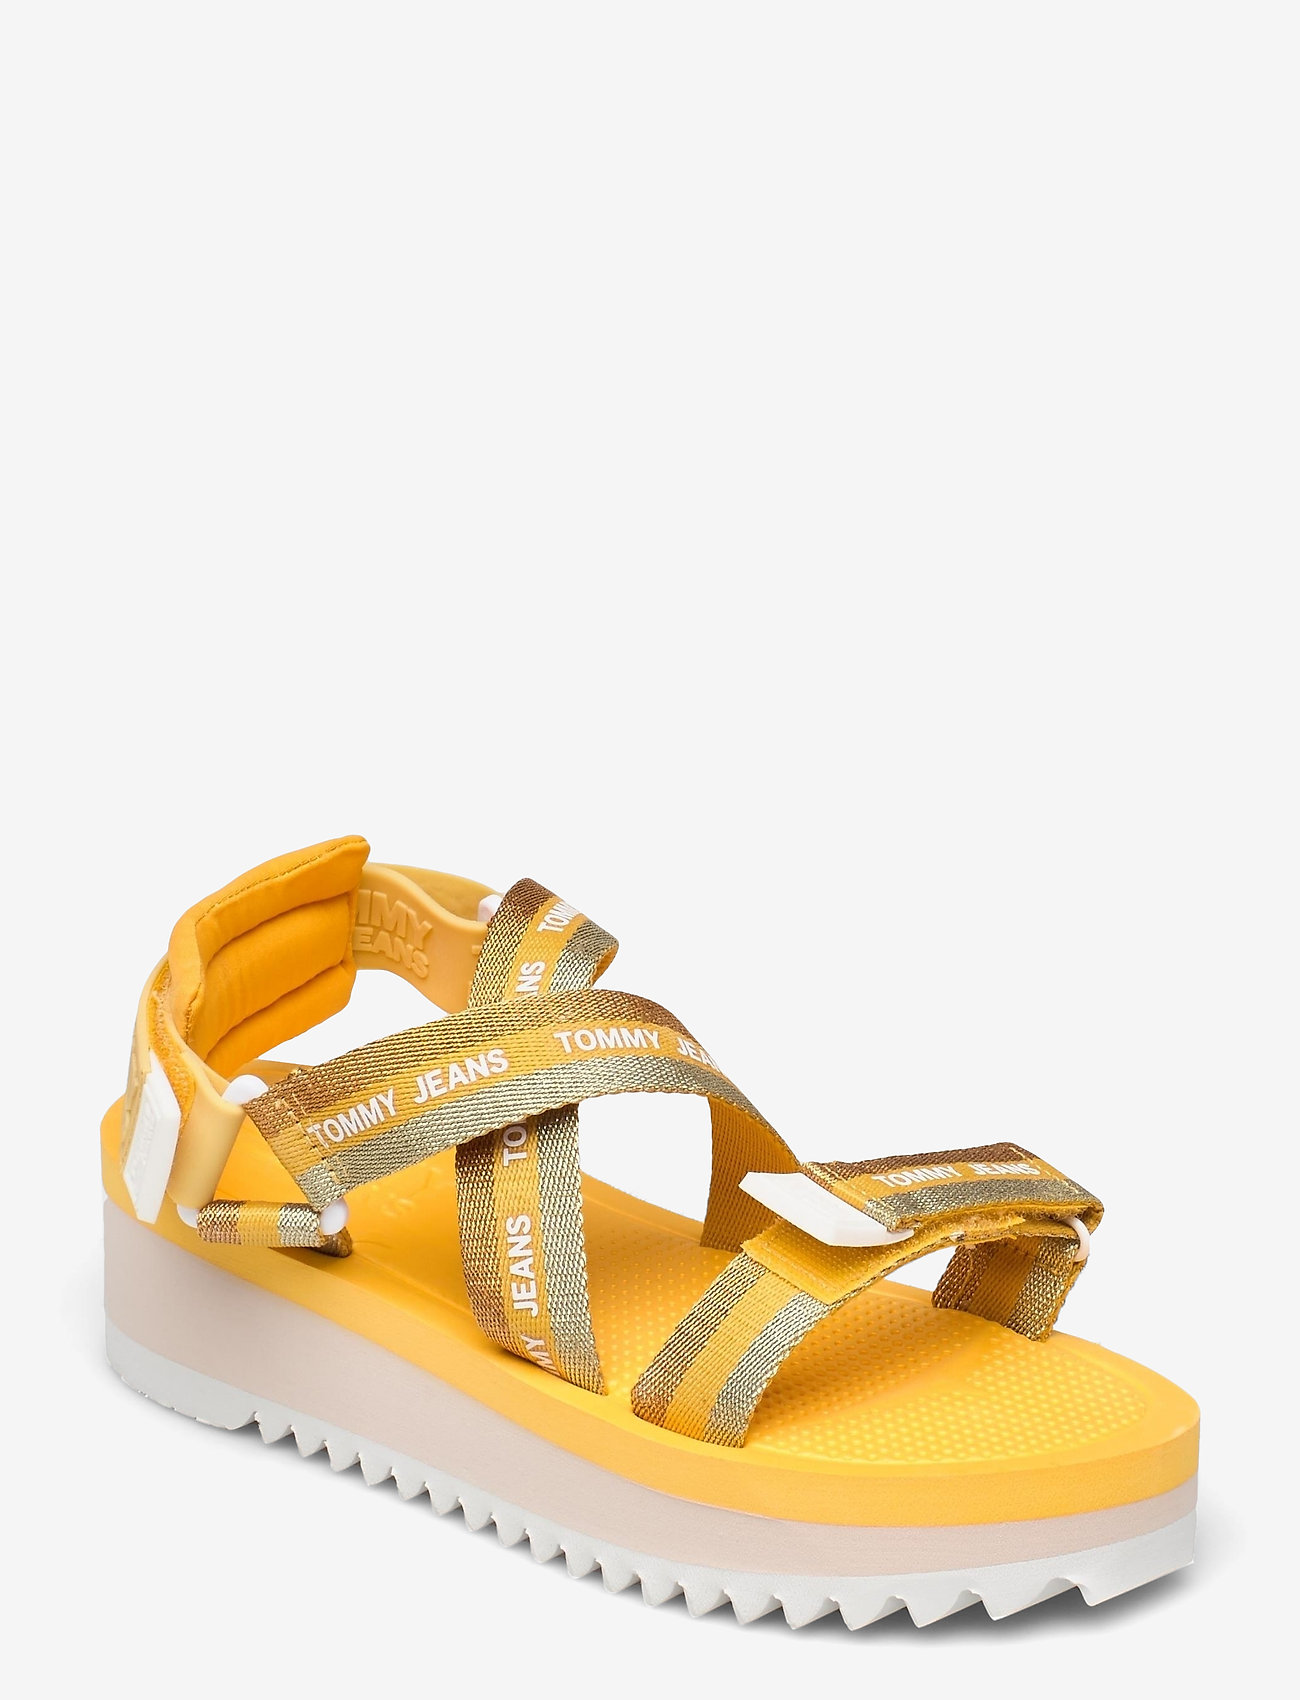 Tommy Hilfiger - LUREX WEBBING STRAPPY SANDAL - flat sandals - florida orange - 0